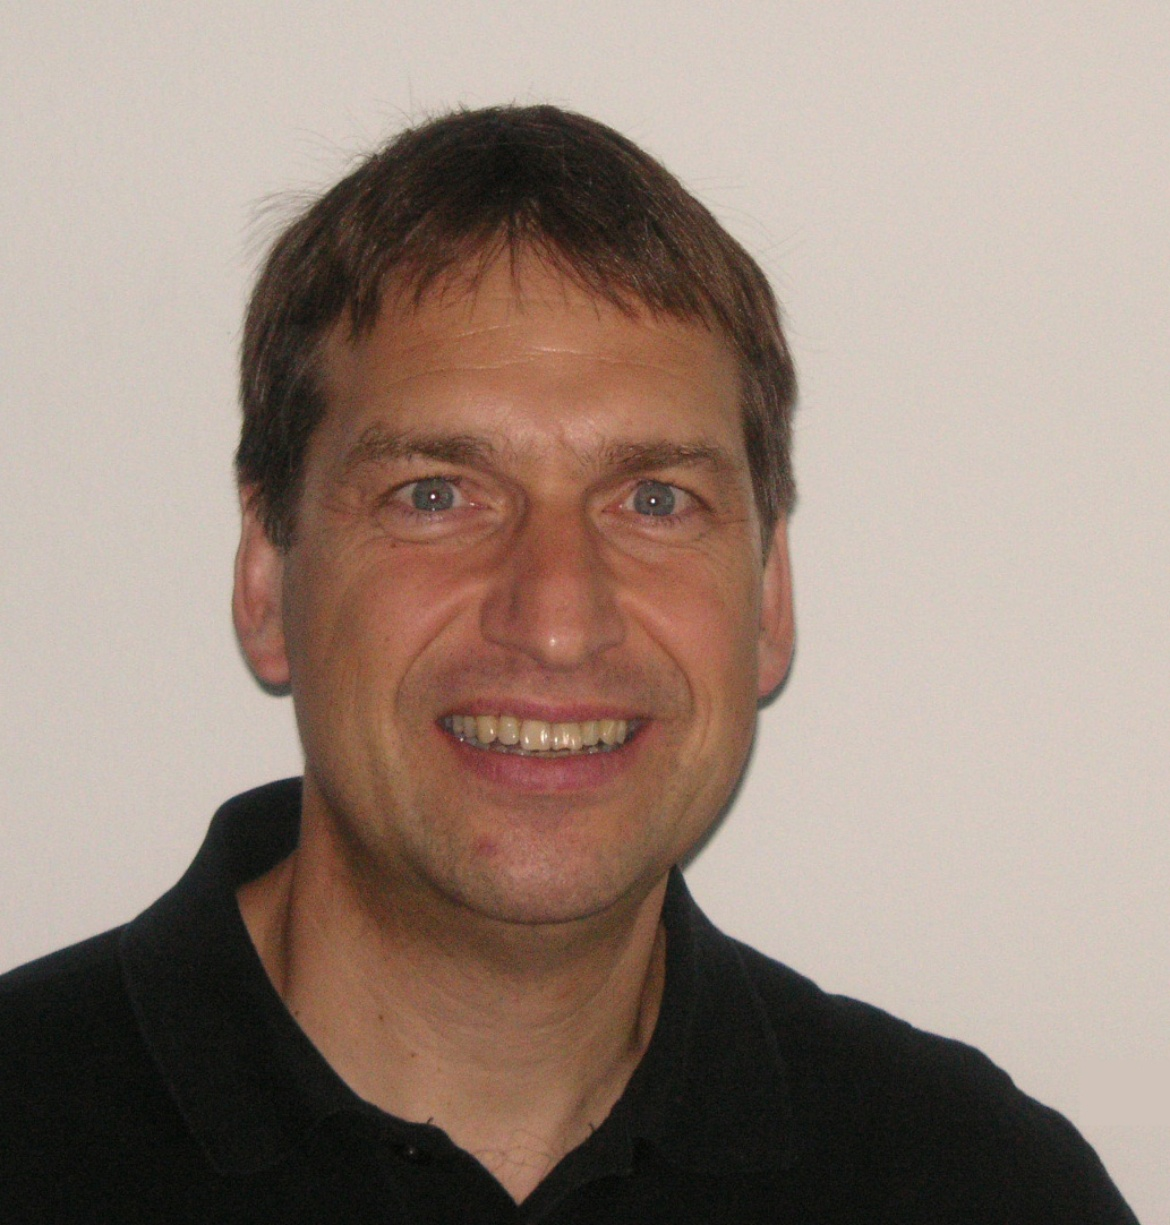 Balthasar Novák (c) ILEK